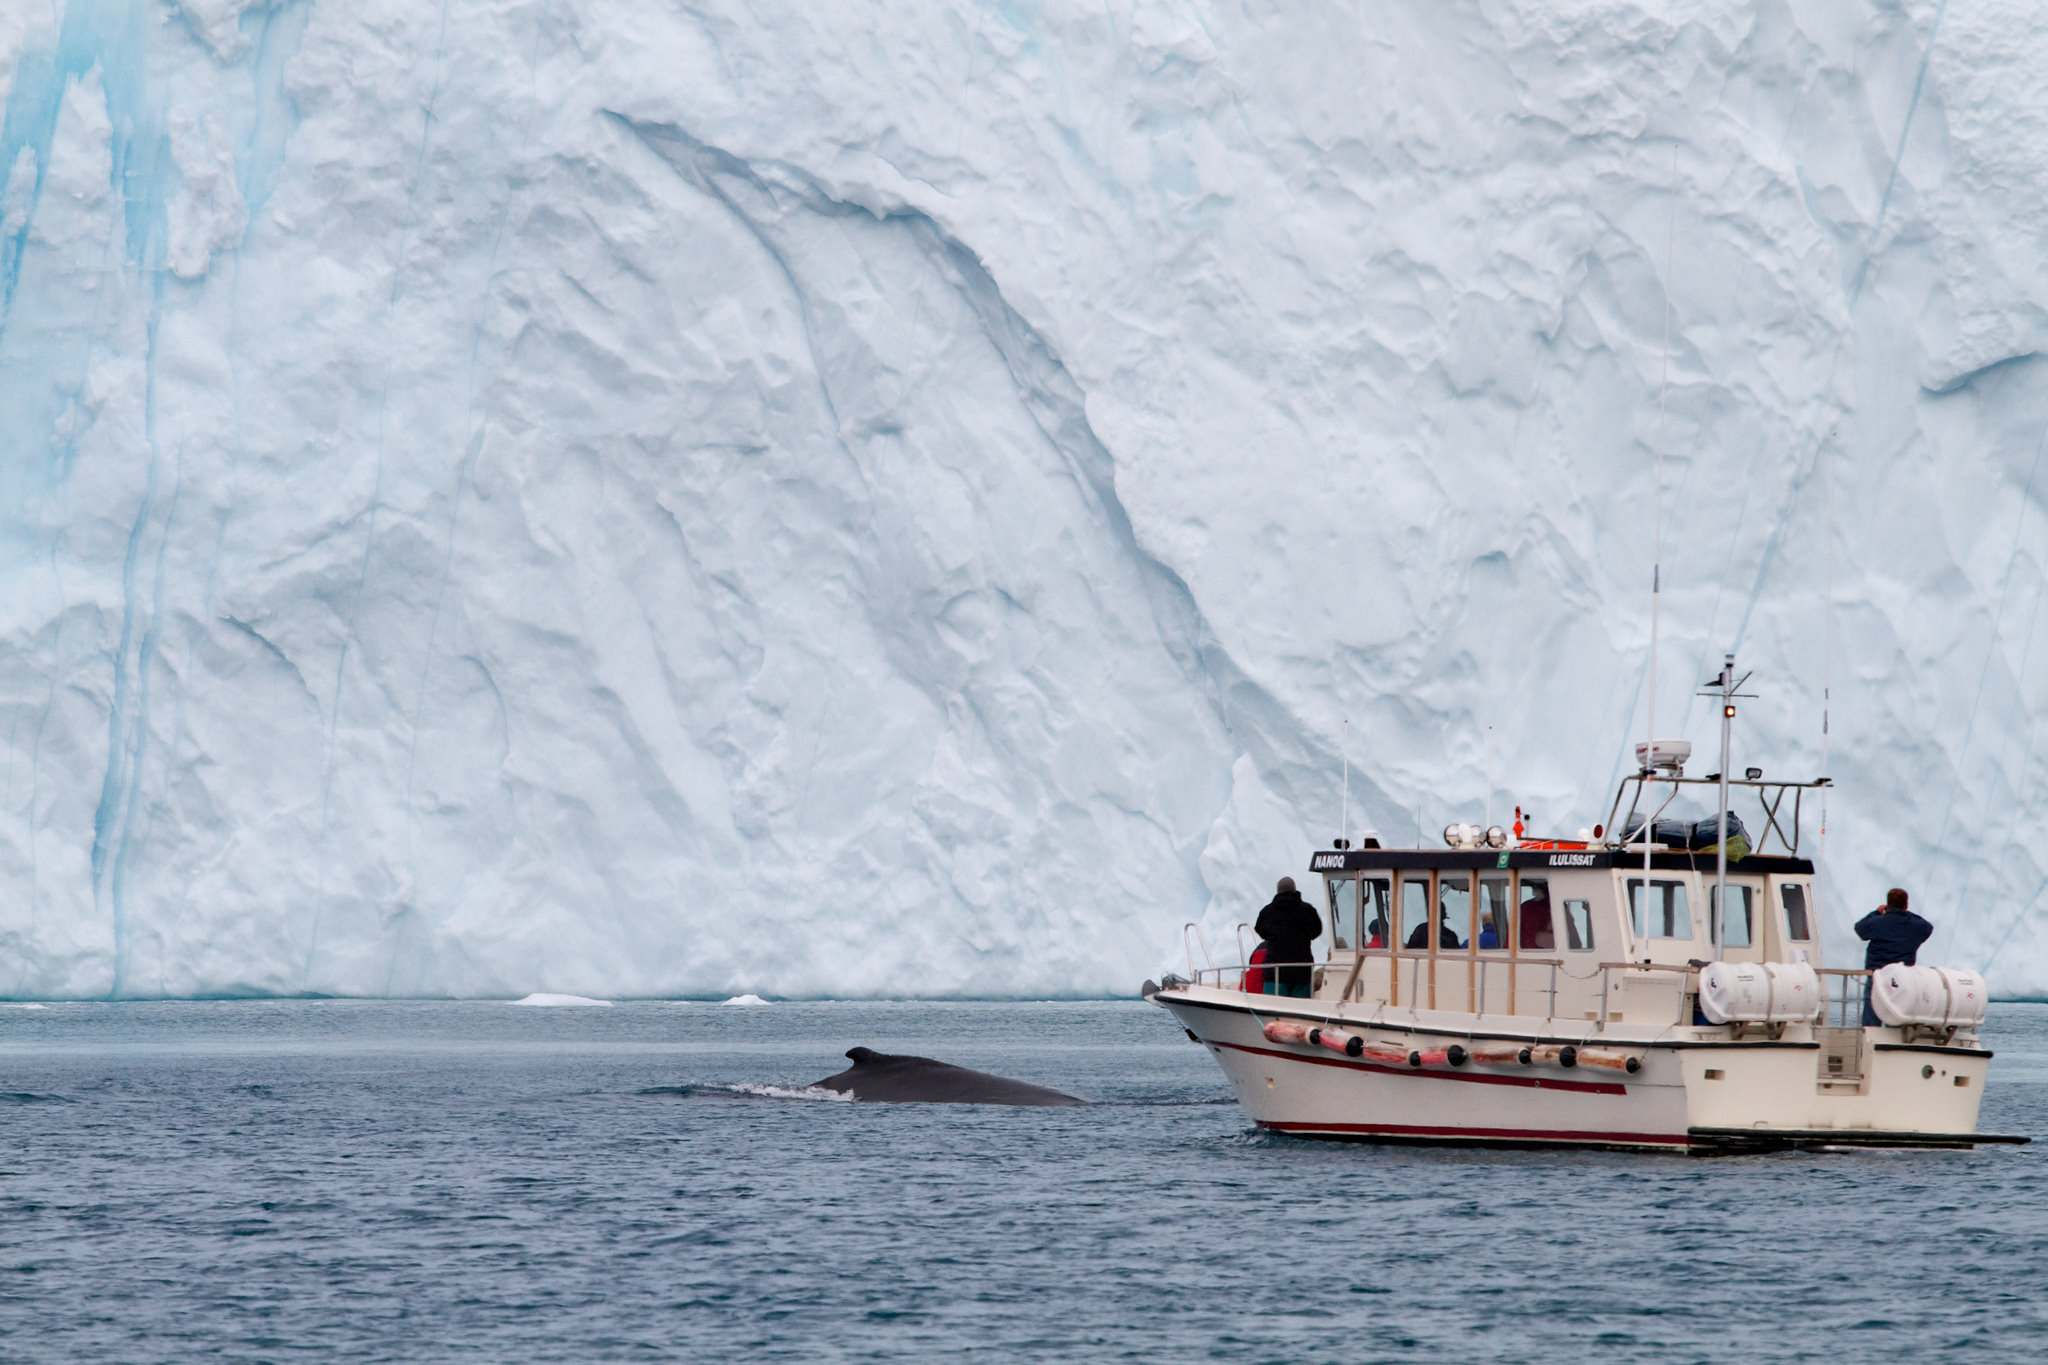 icefjord ilulissat7 The icefjord in Ilulissat, Greenland